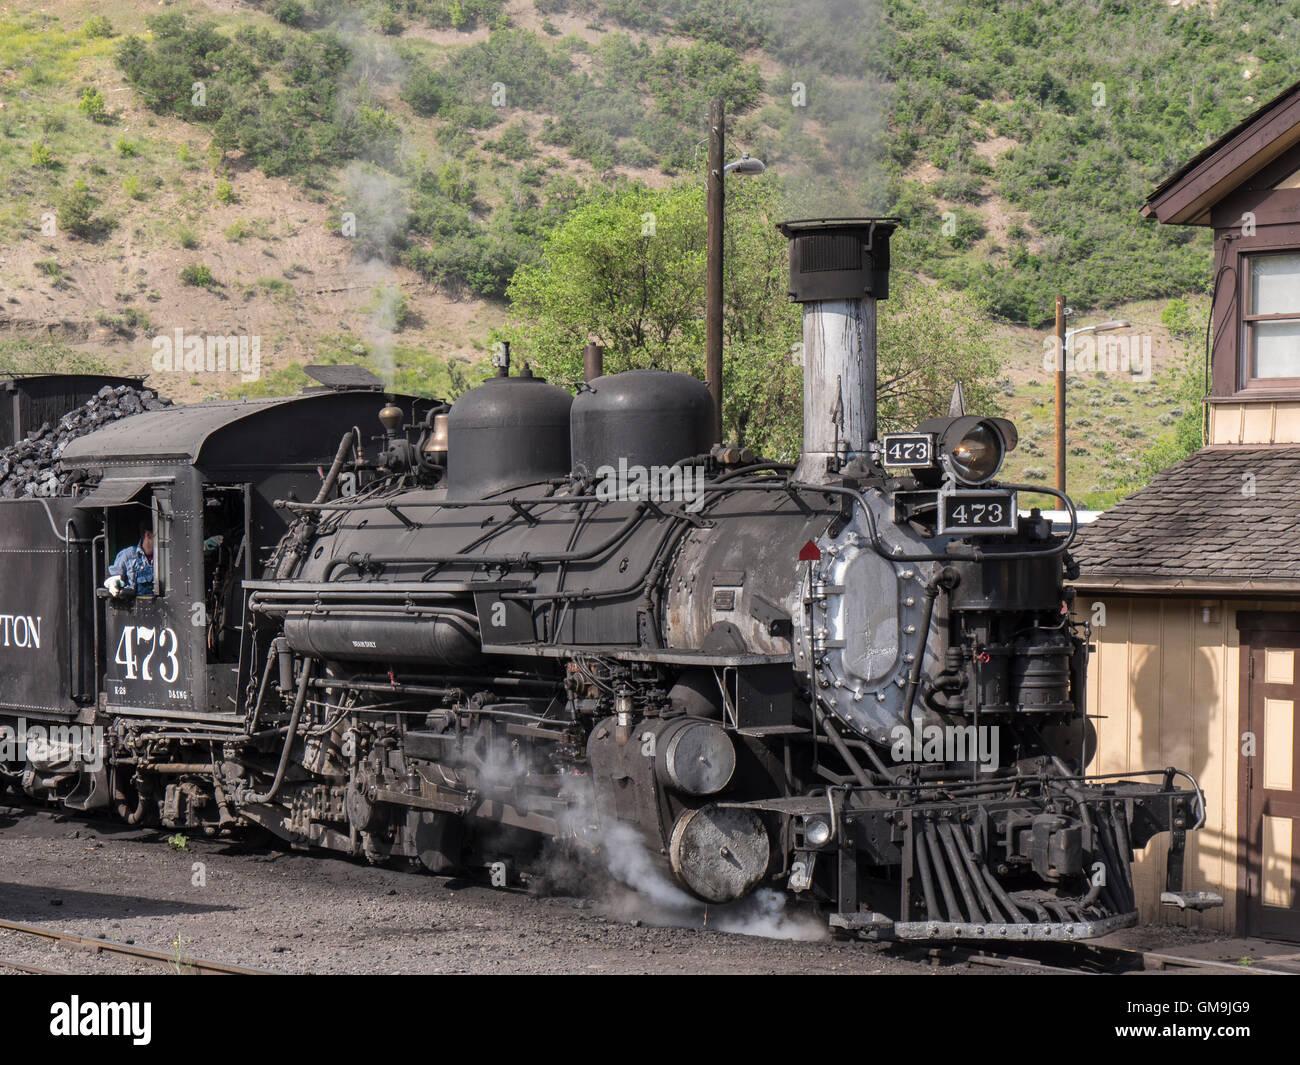 Durango & Silverton Narrow Gauge locomotive 473 at the station, Durango, Colorado. - Stock Image